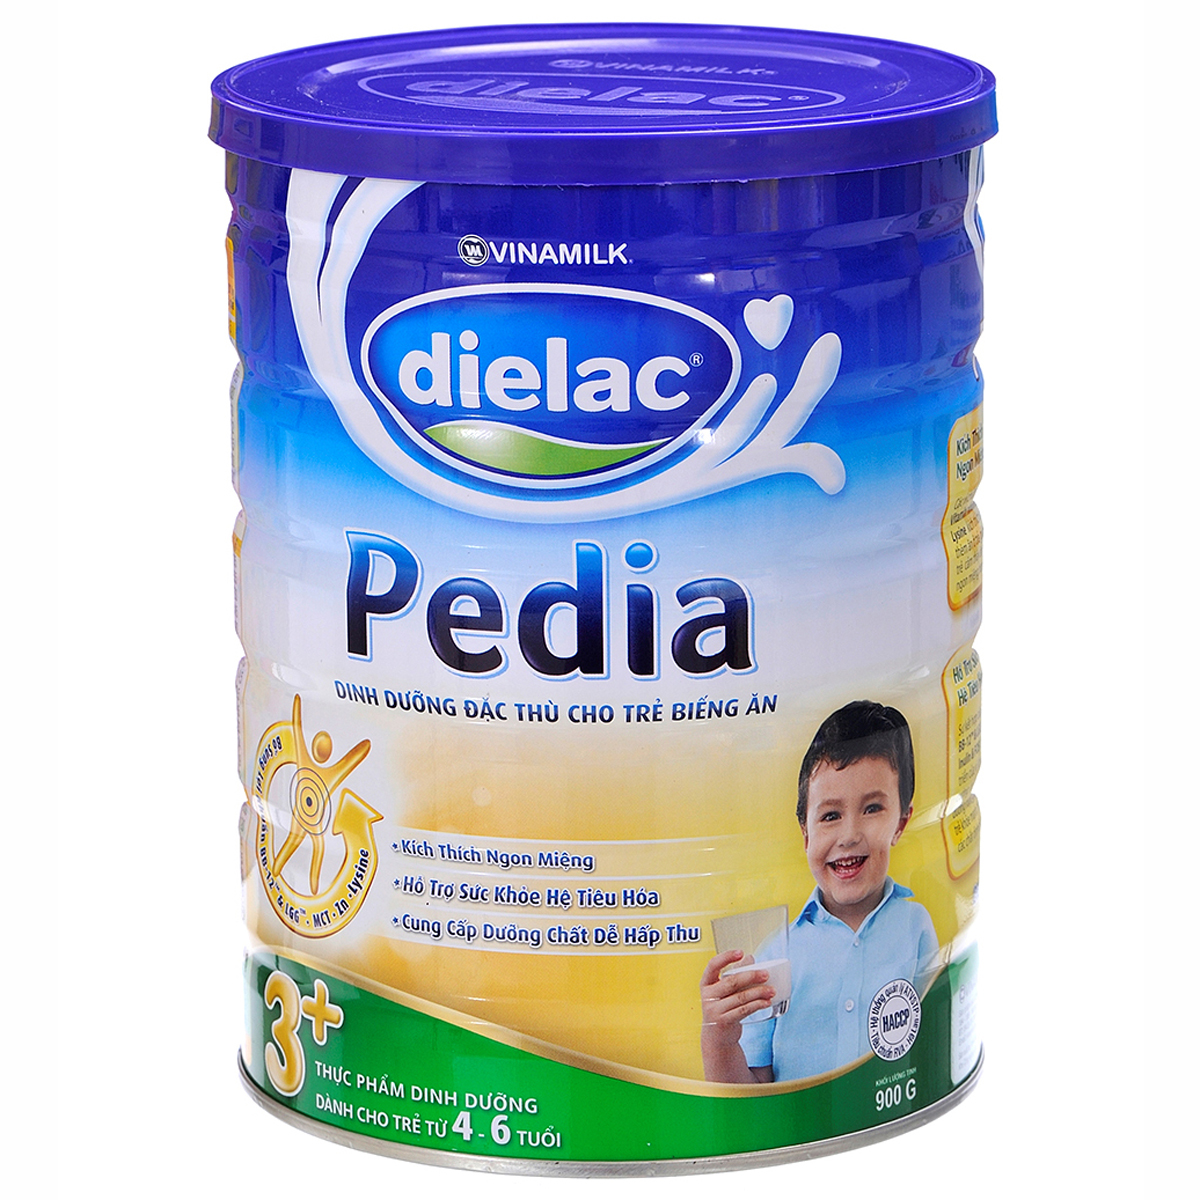 Sua bot Dielac Pedia 3+ hop thiec 900g